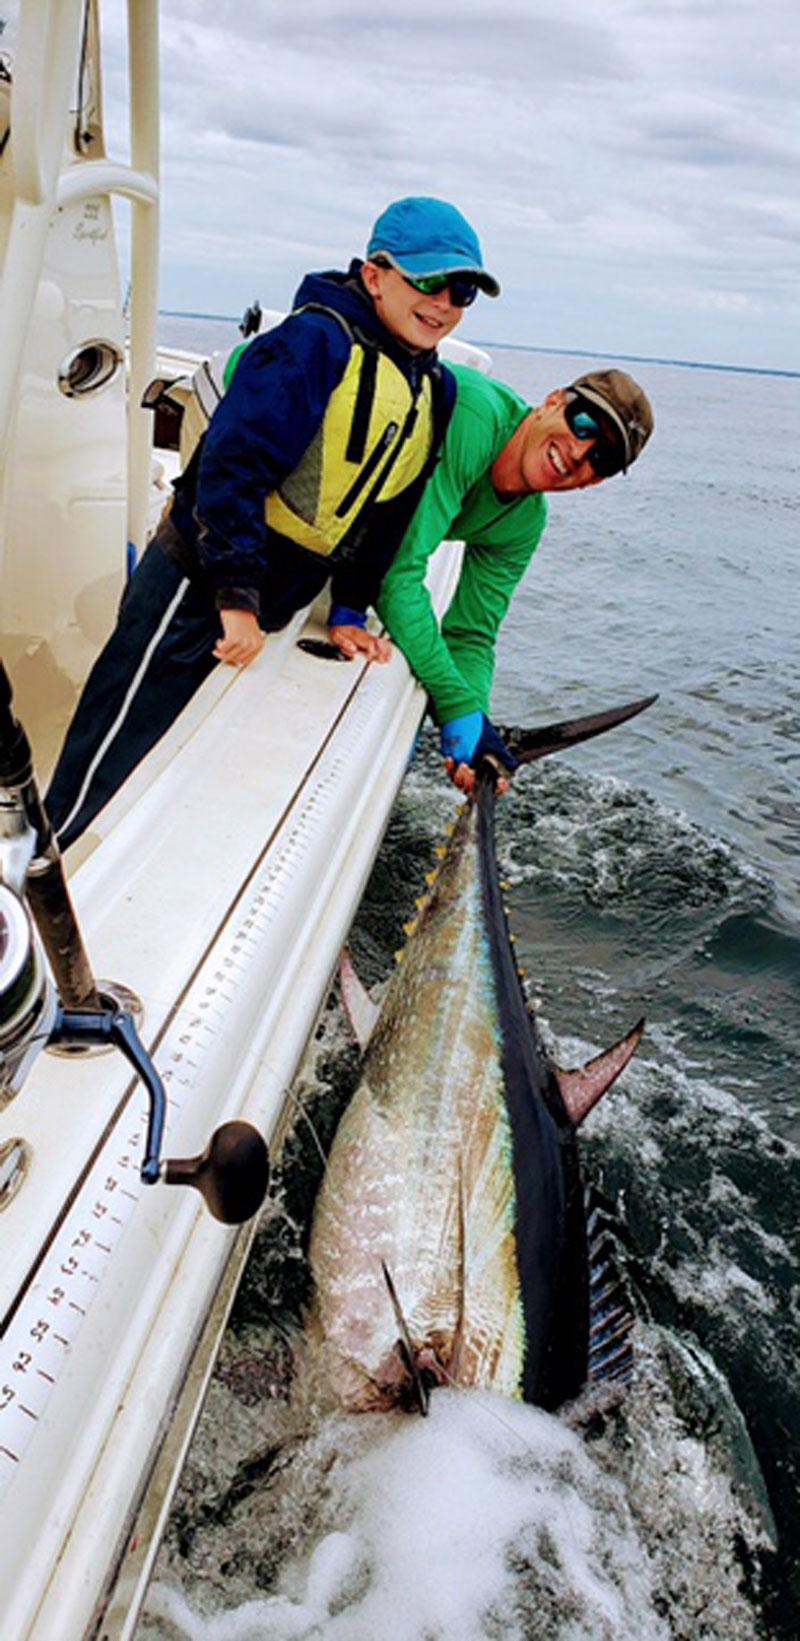 James Garland and his son tuna